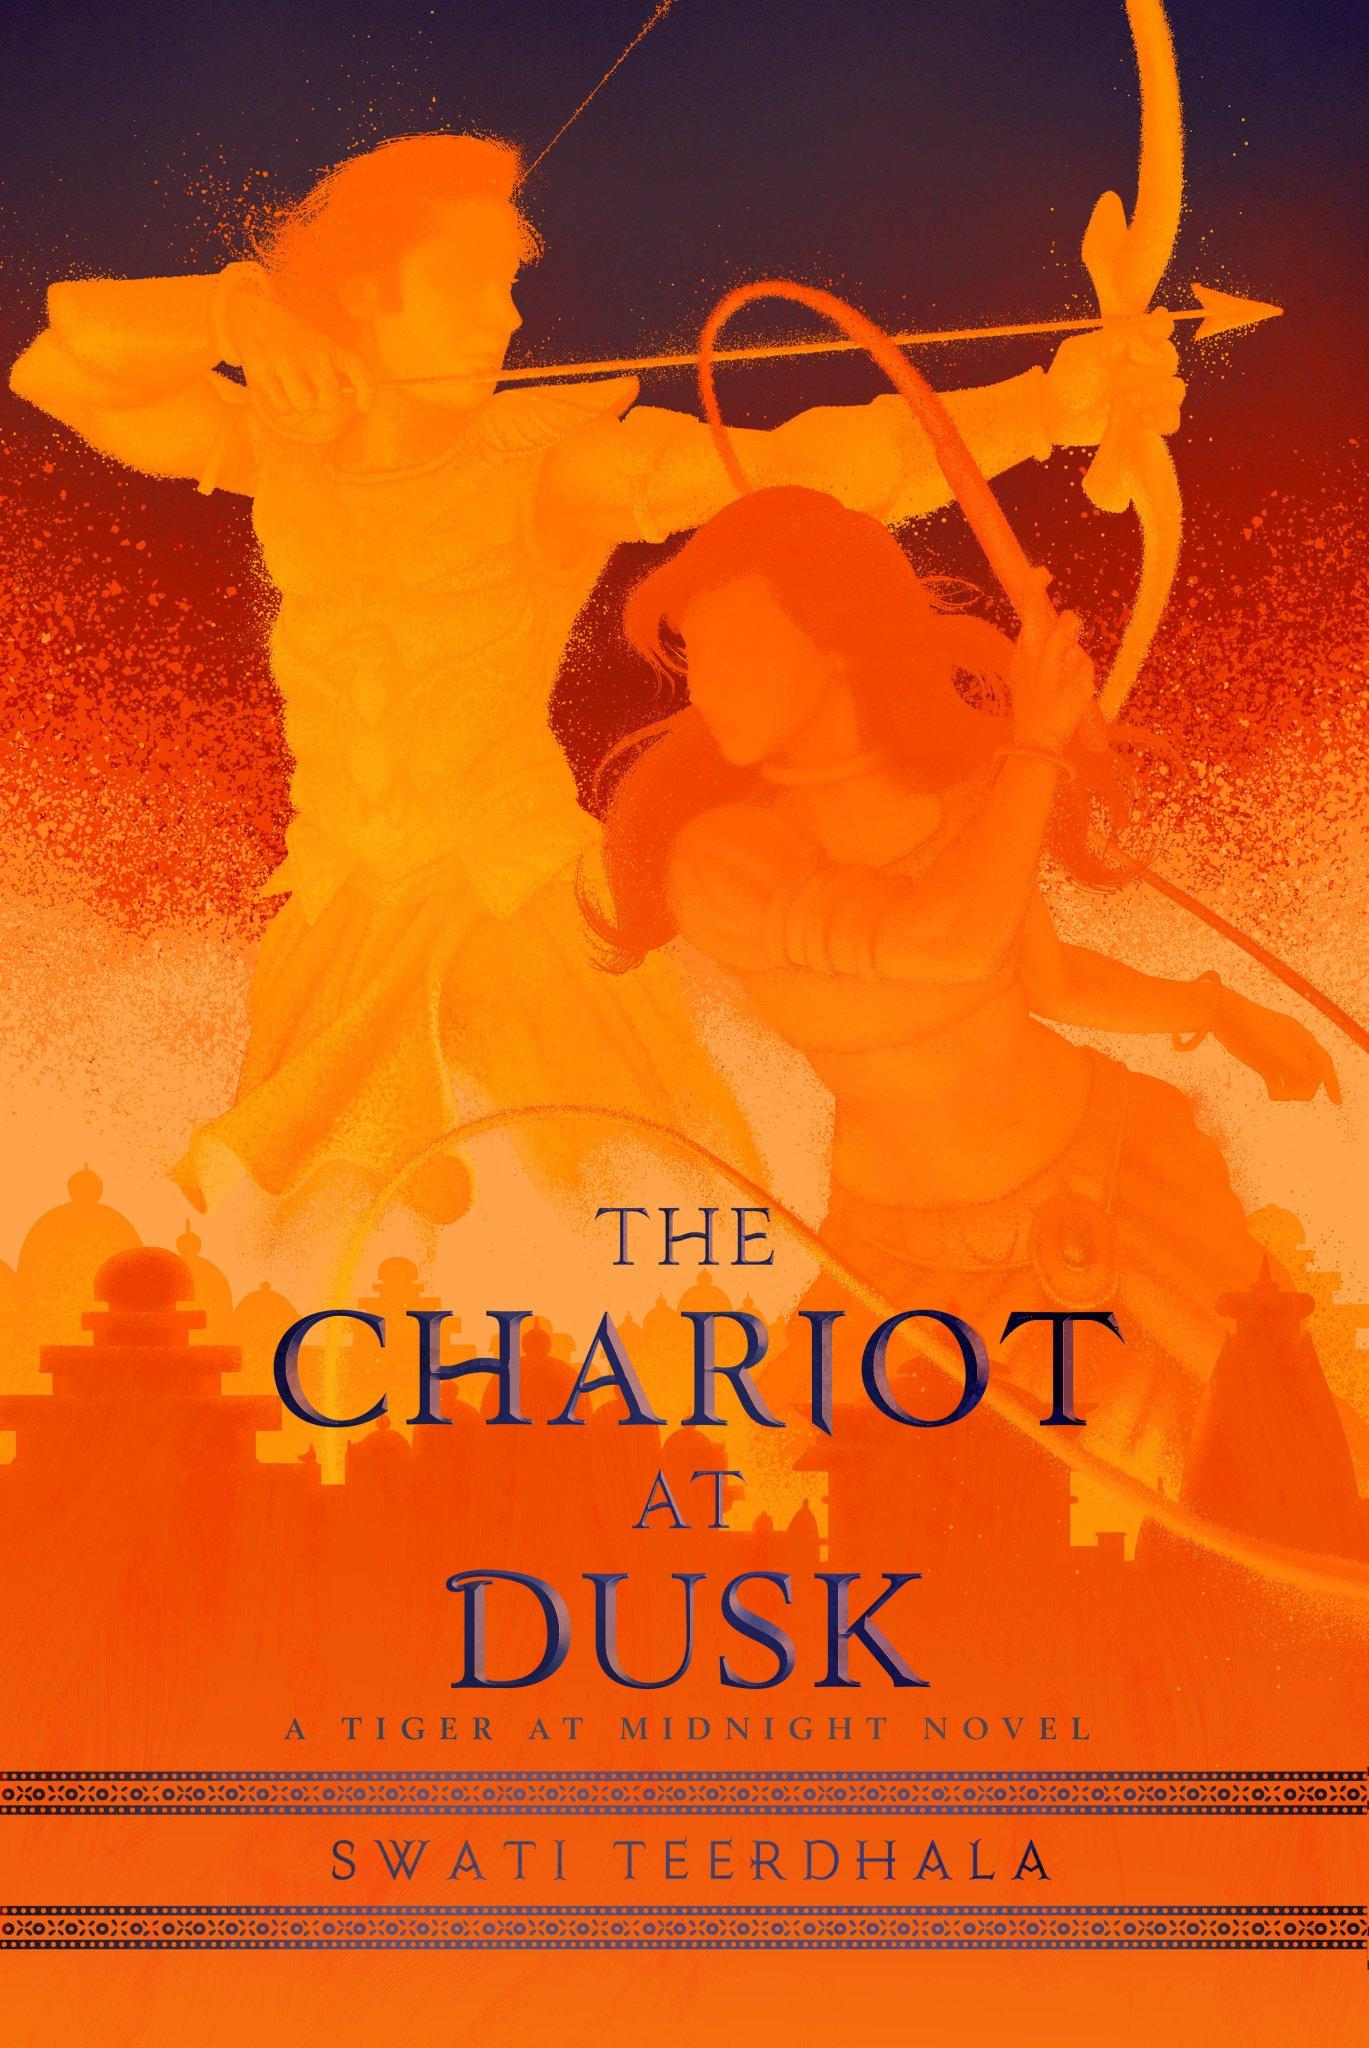 The Chariot at Dusk Swati Teerdhala Book Cover